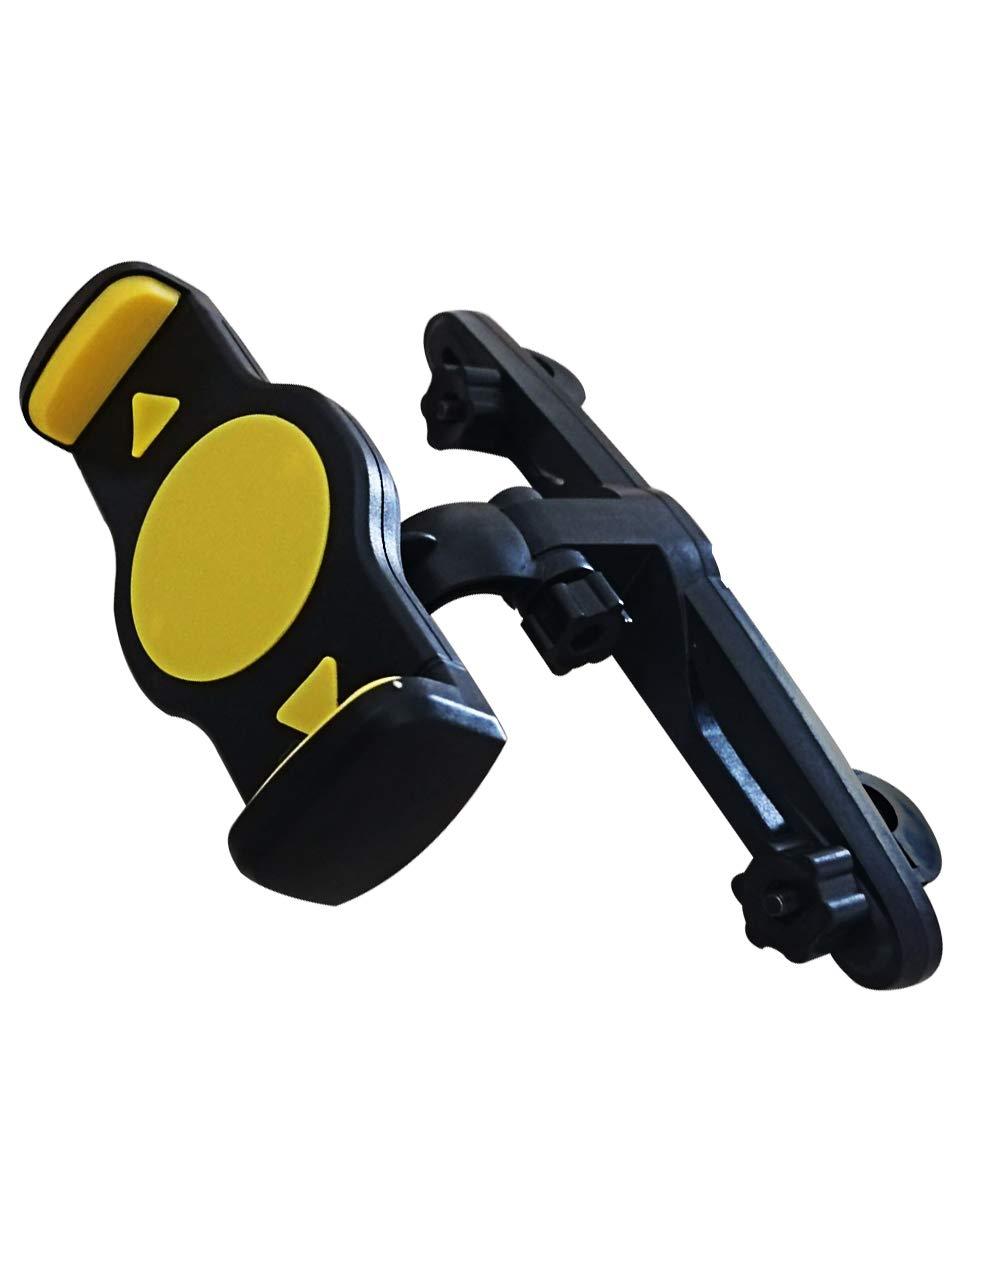 Manords Car Headrest Mount, Tablet Headrest Holder Flexible Back Seat Bracket with Adjustable Holding Clamp for 4.2-7.4 Inch Tablets